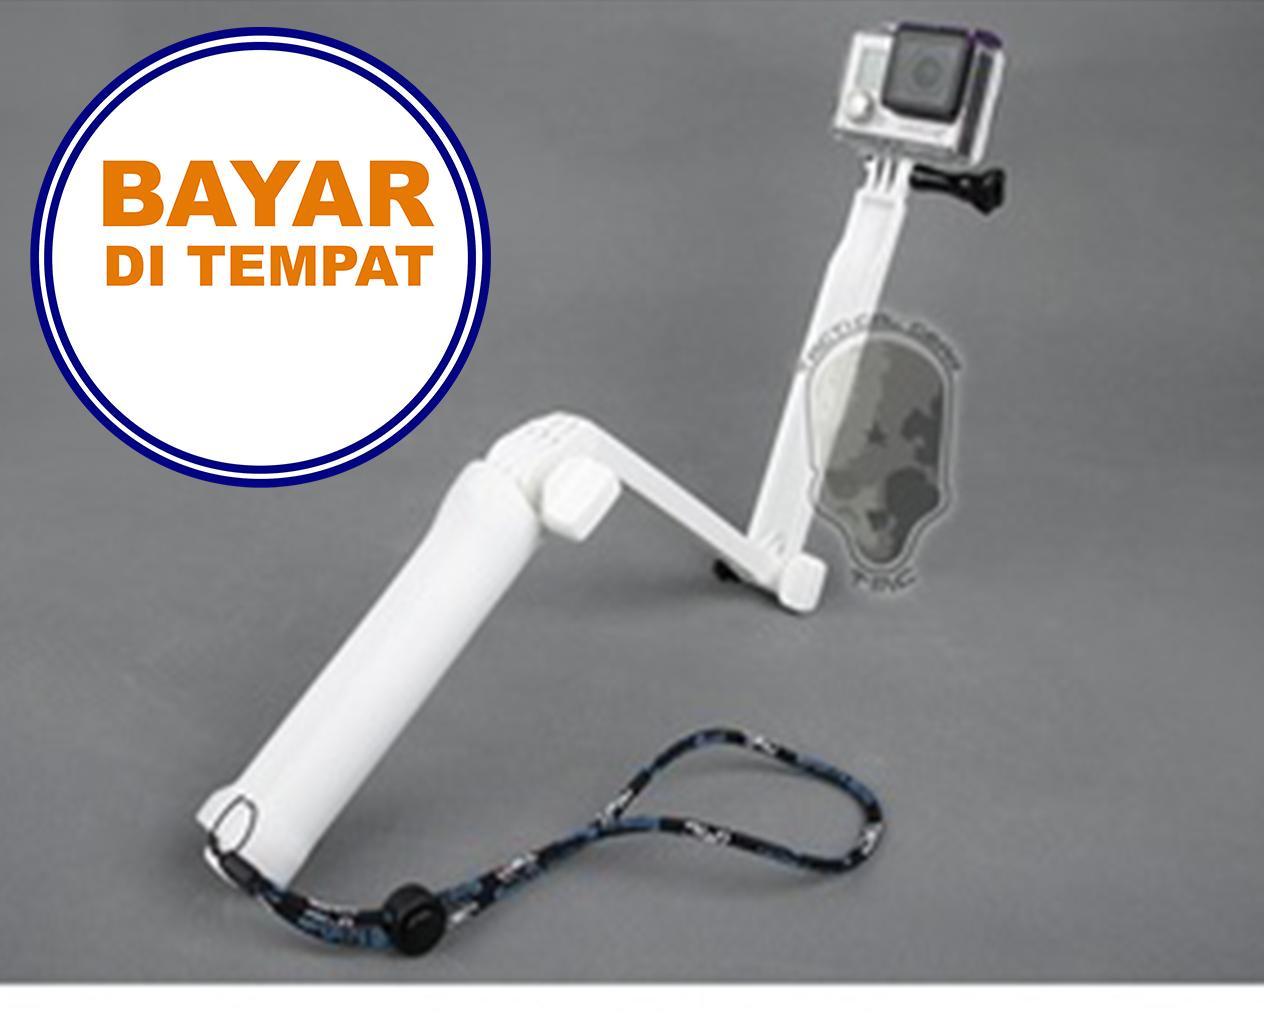 gopro_rechargeable-battery-gopro-hero5-black_full08 Harga Gopro Saat Ini Terbaru Maret 2019